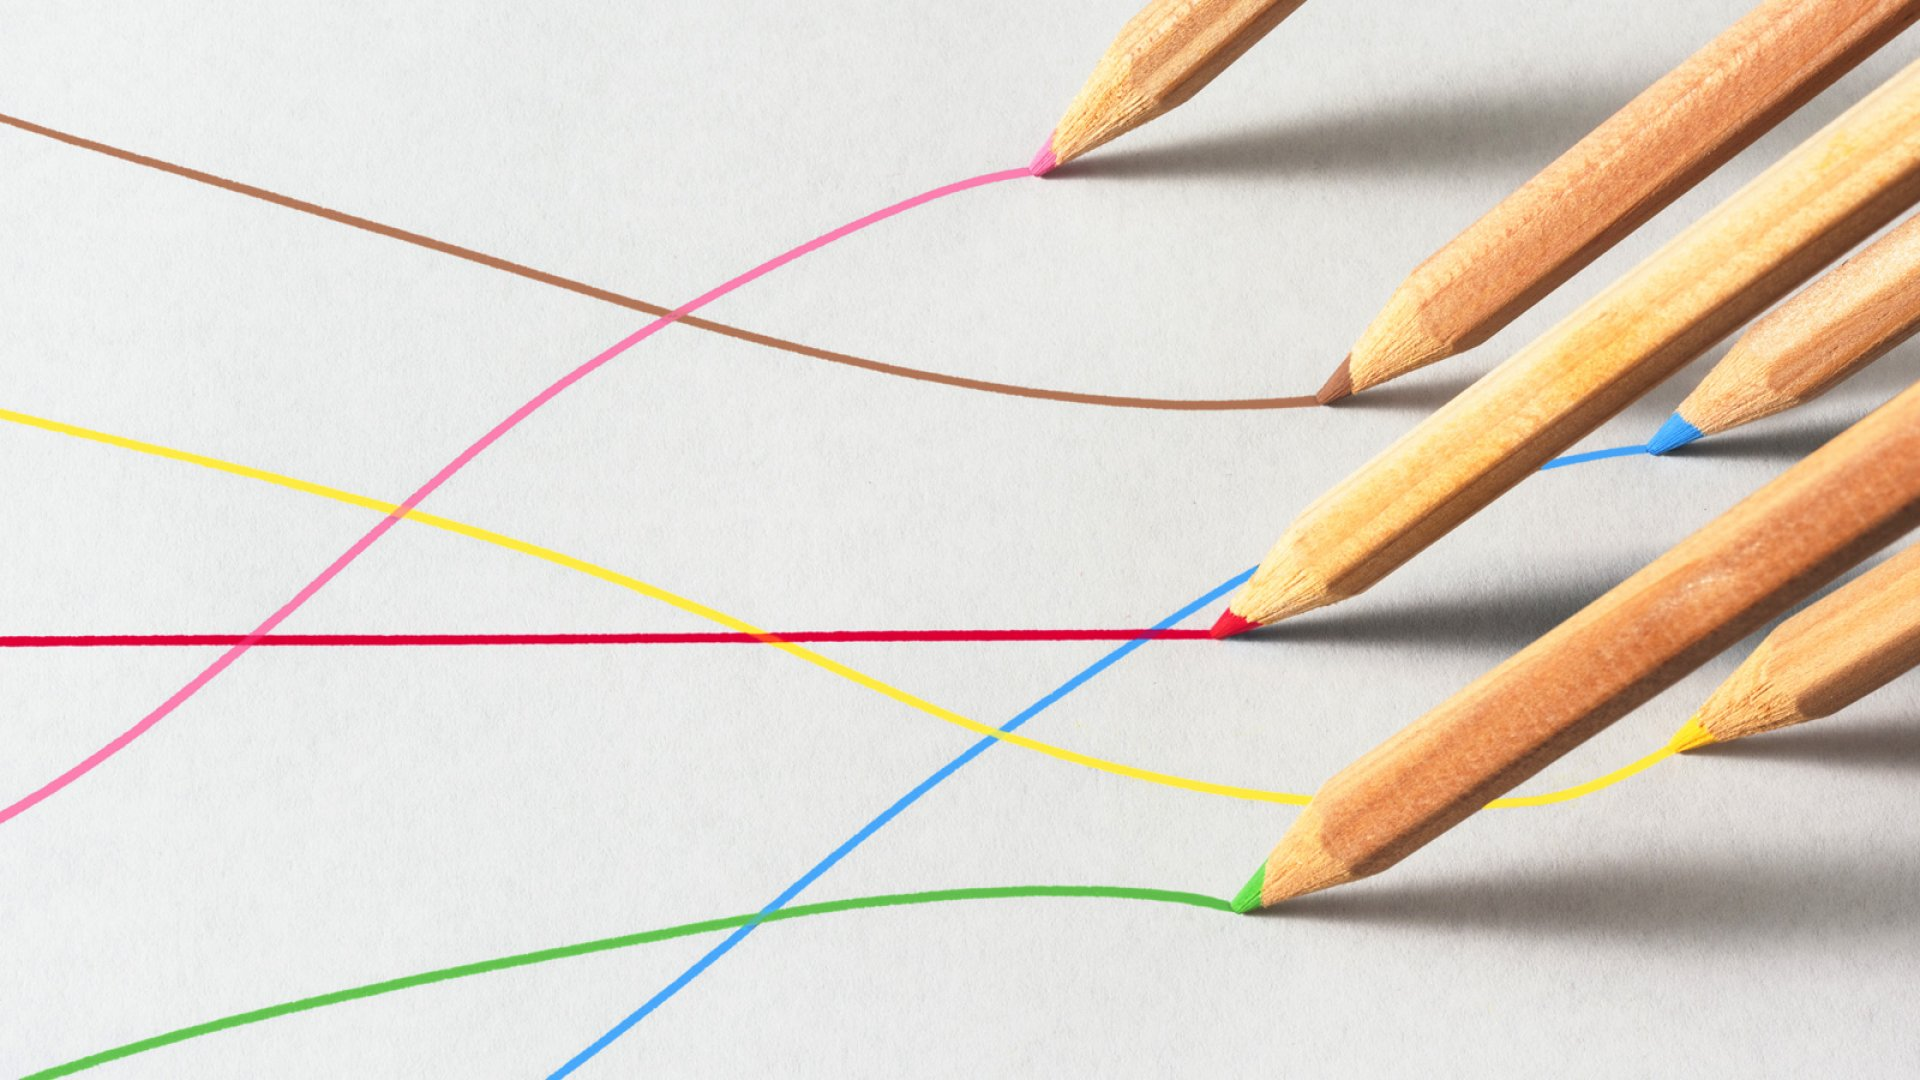 6 Surprising Ways to Get More Creative